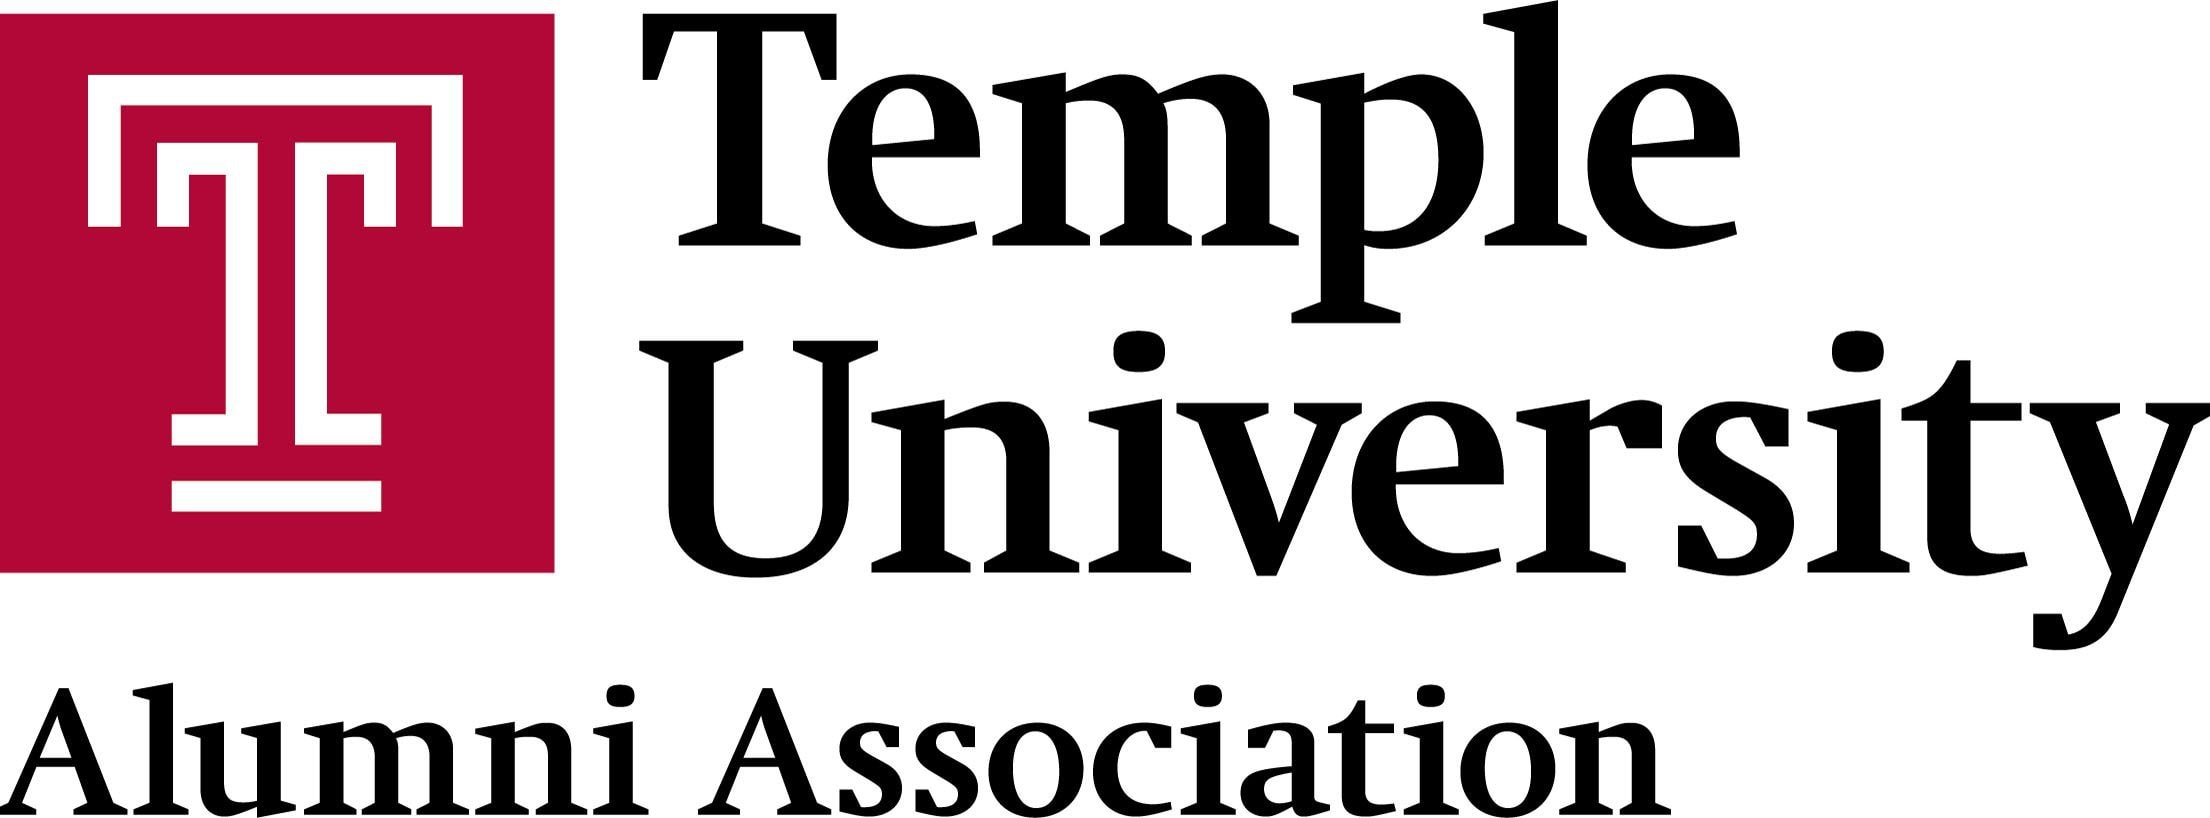 Temple University Alumni Association logo